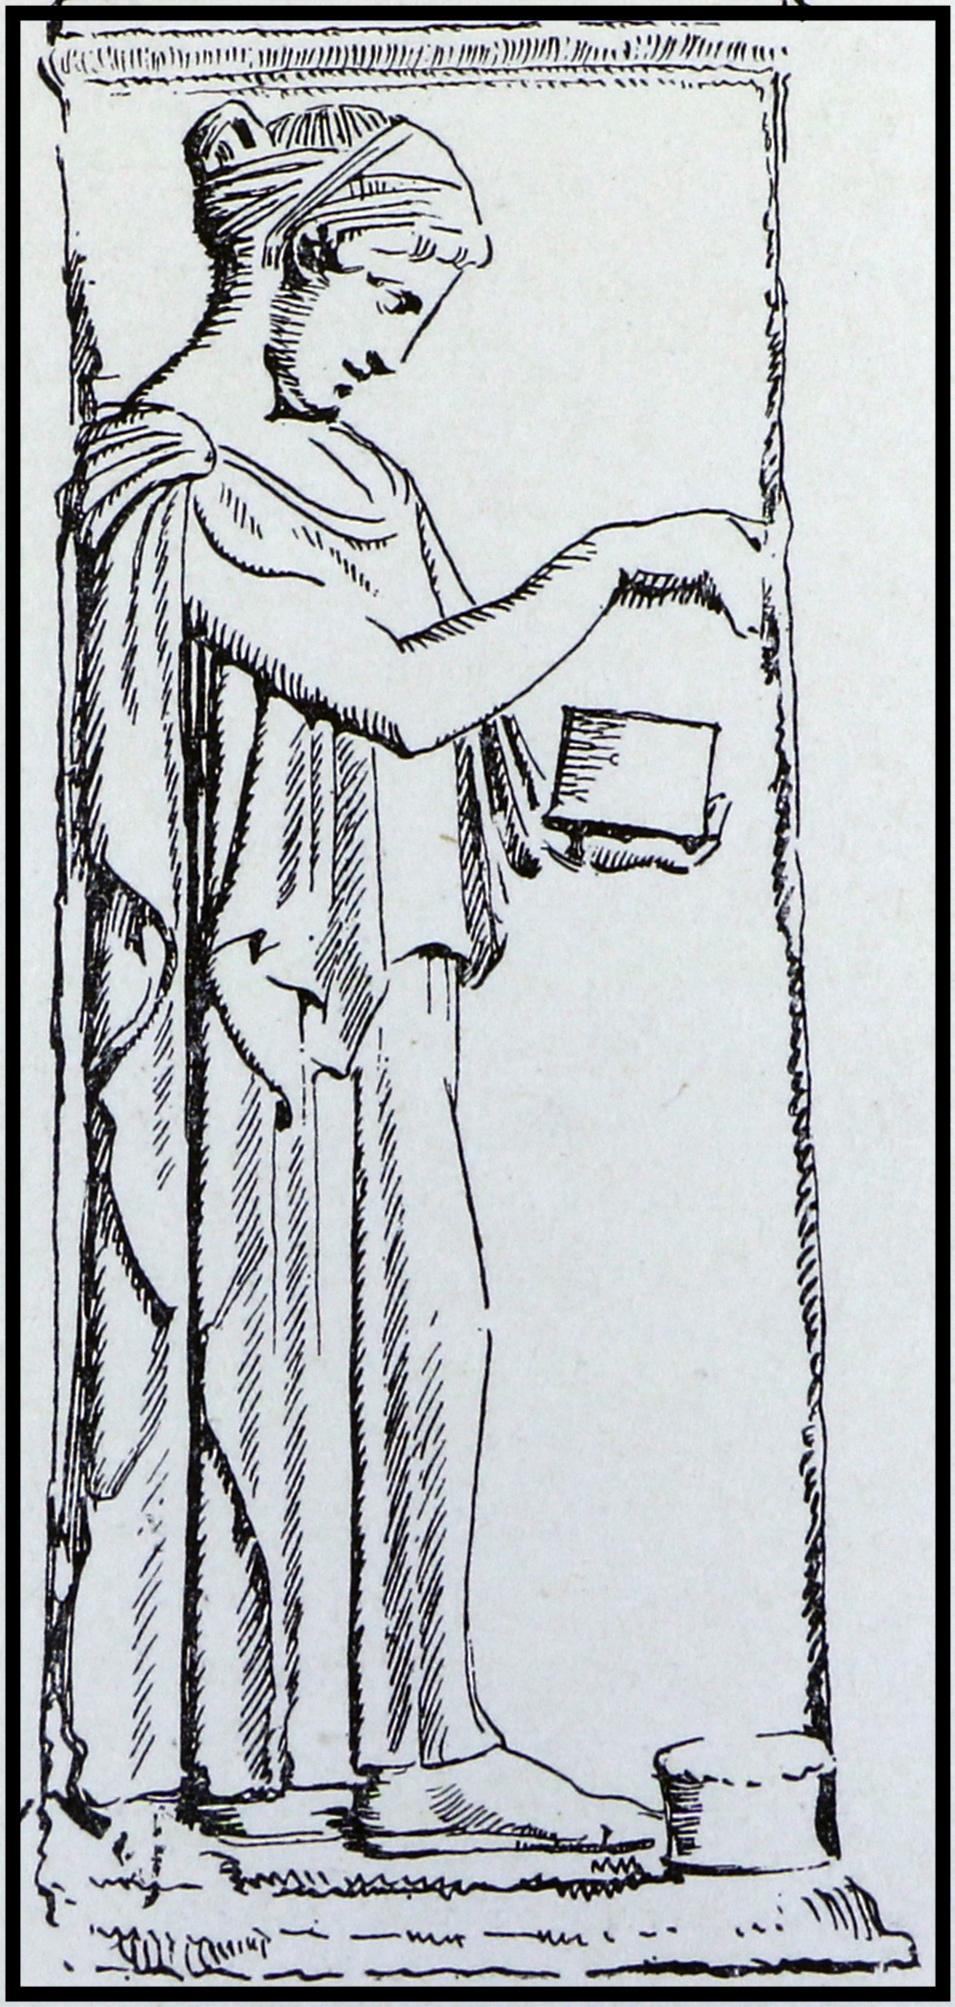 Allen Seaby, Leon of Massalia, Chapter 20: The new dress